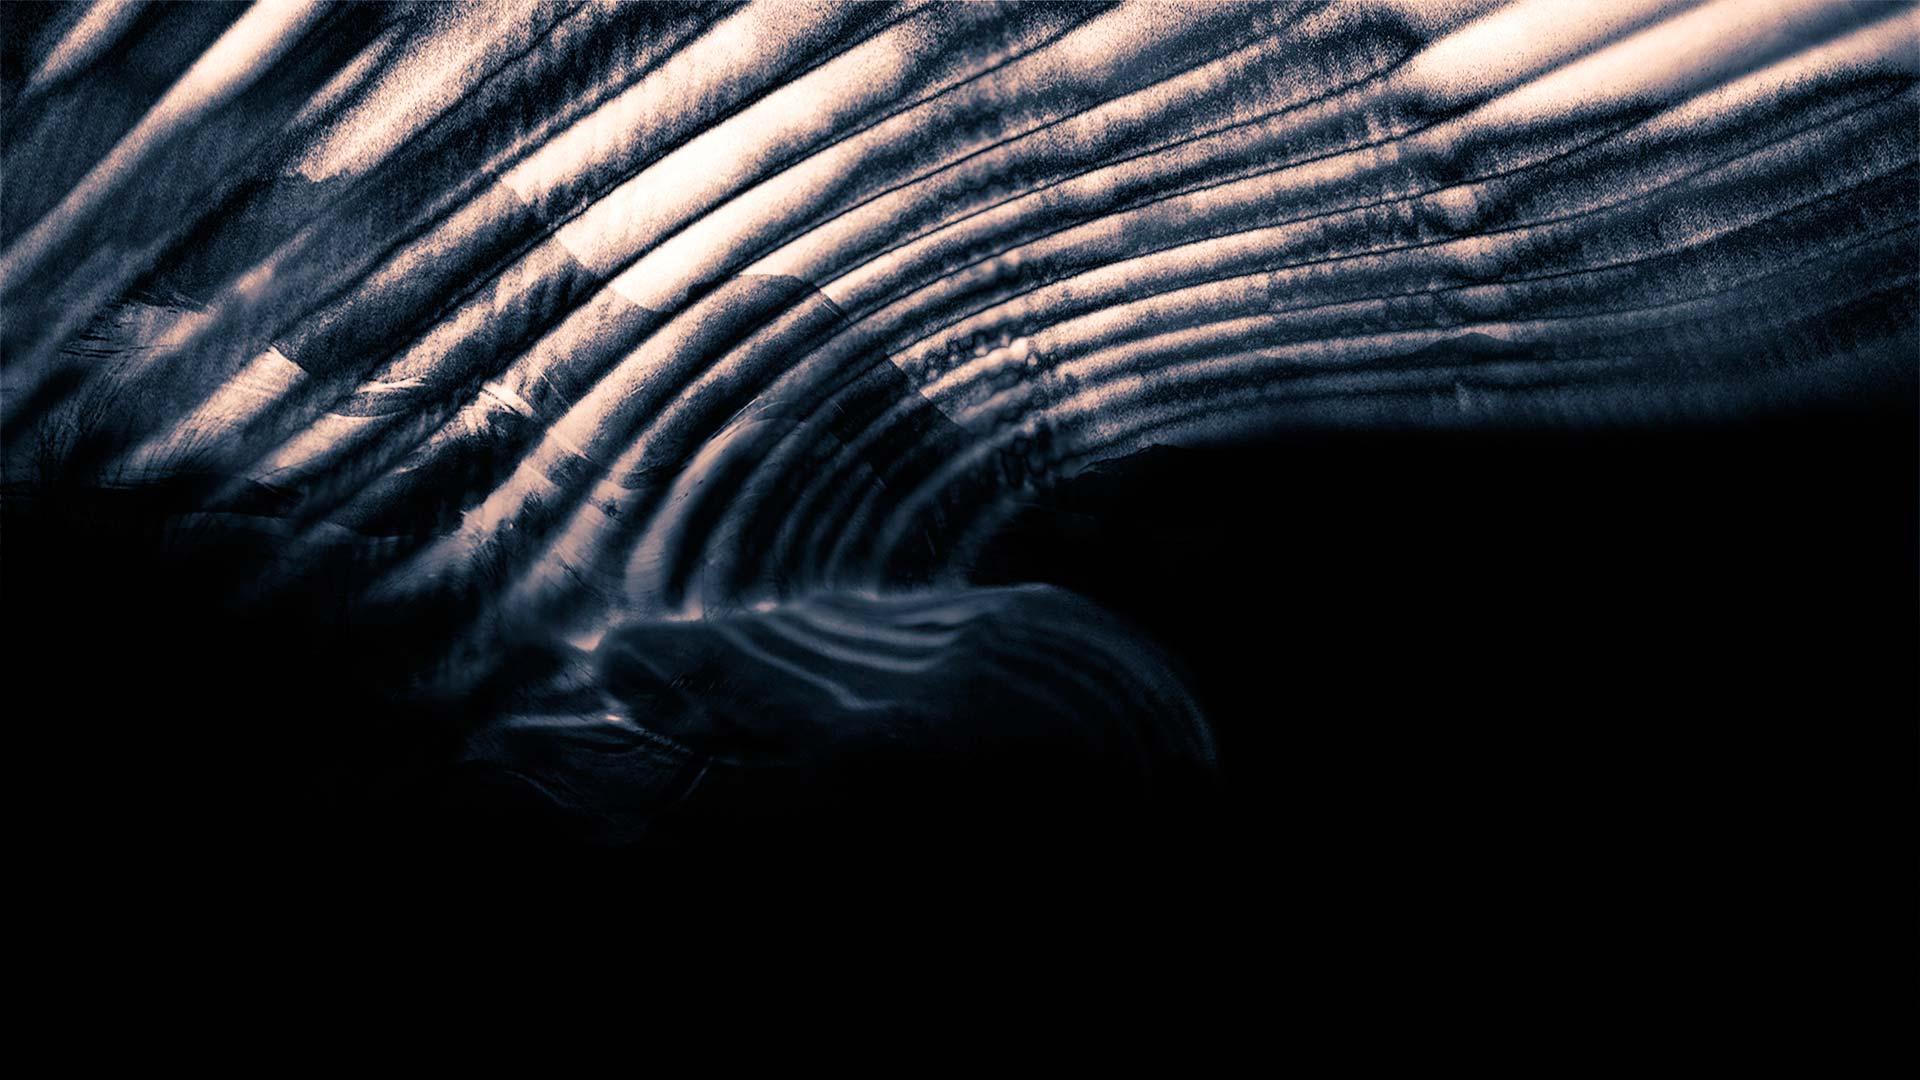 151210_Spaceandtime_DesertBreath_schermres